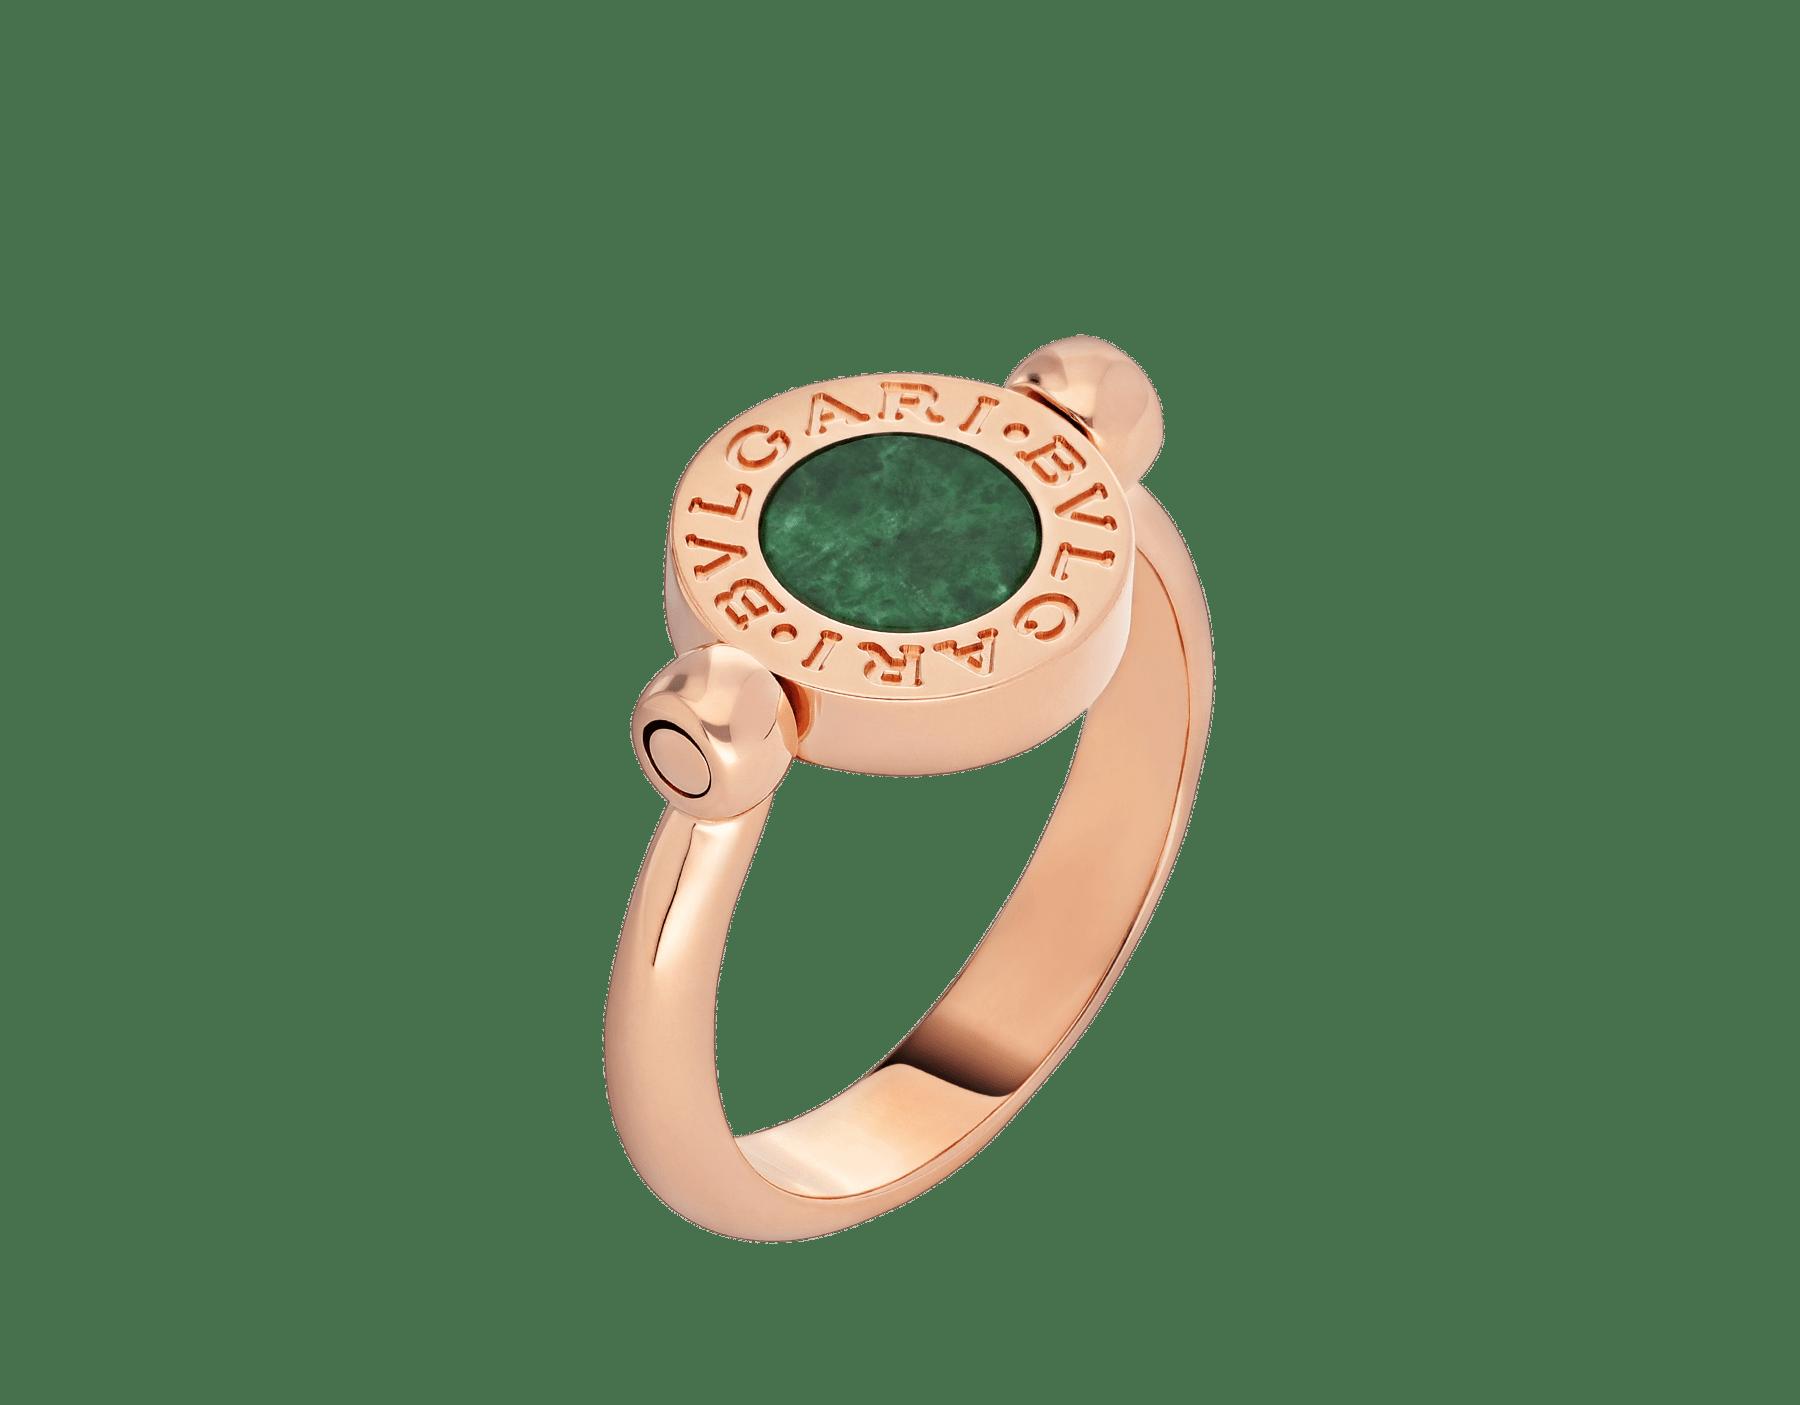 BVLGARI BVLGARI 18 kt rose gold flip ring set with green jade and pavé diamonds AN857356 image 1